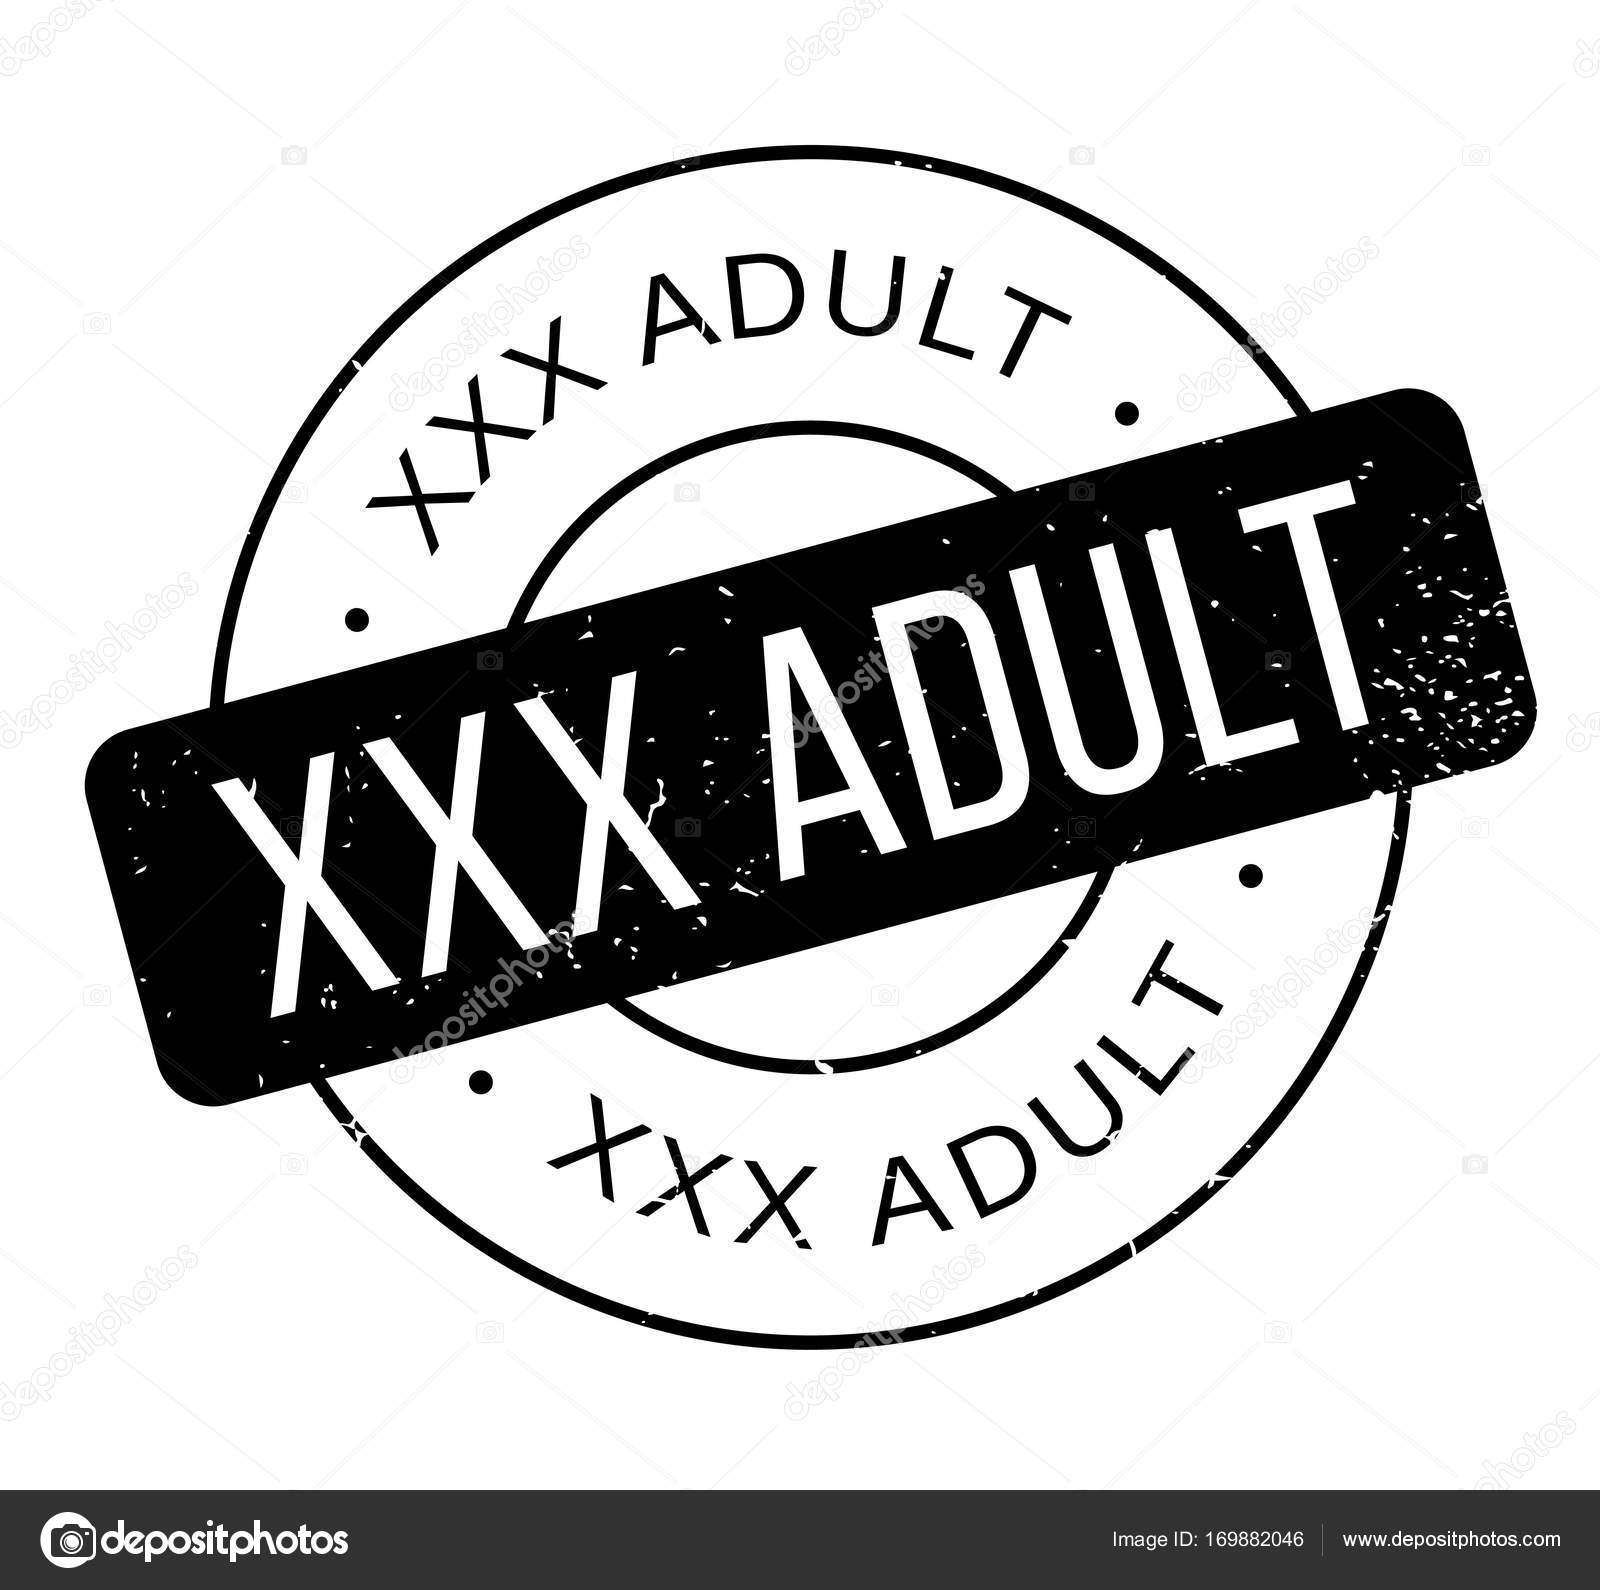 XXX ιστοσελίδες ταινιών μαύρη λεσβία σειρά